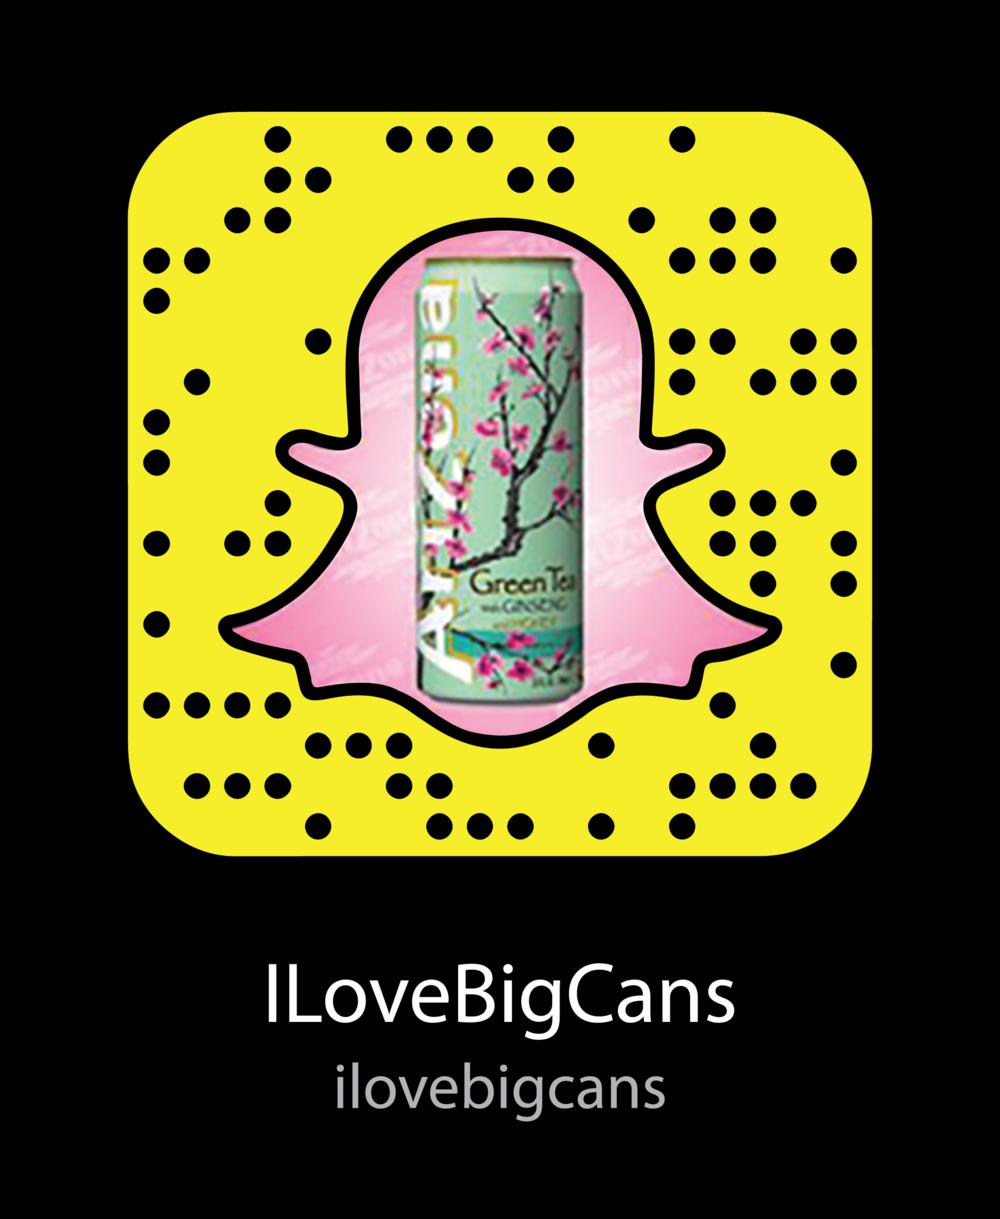 ilovebigcans-Brands-snapchat-snapcode.png